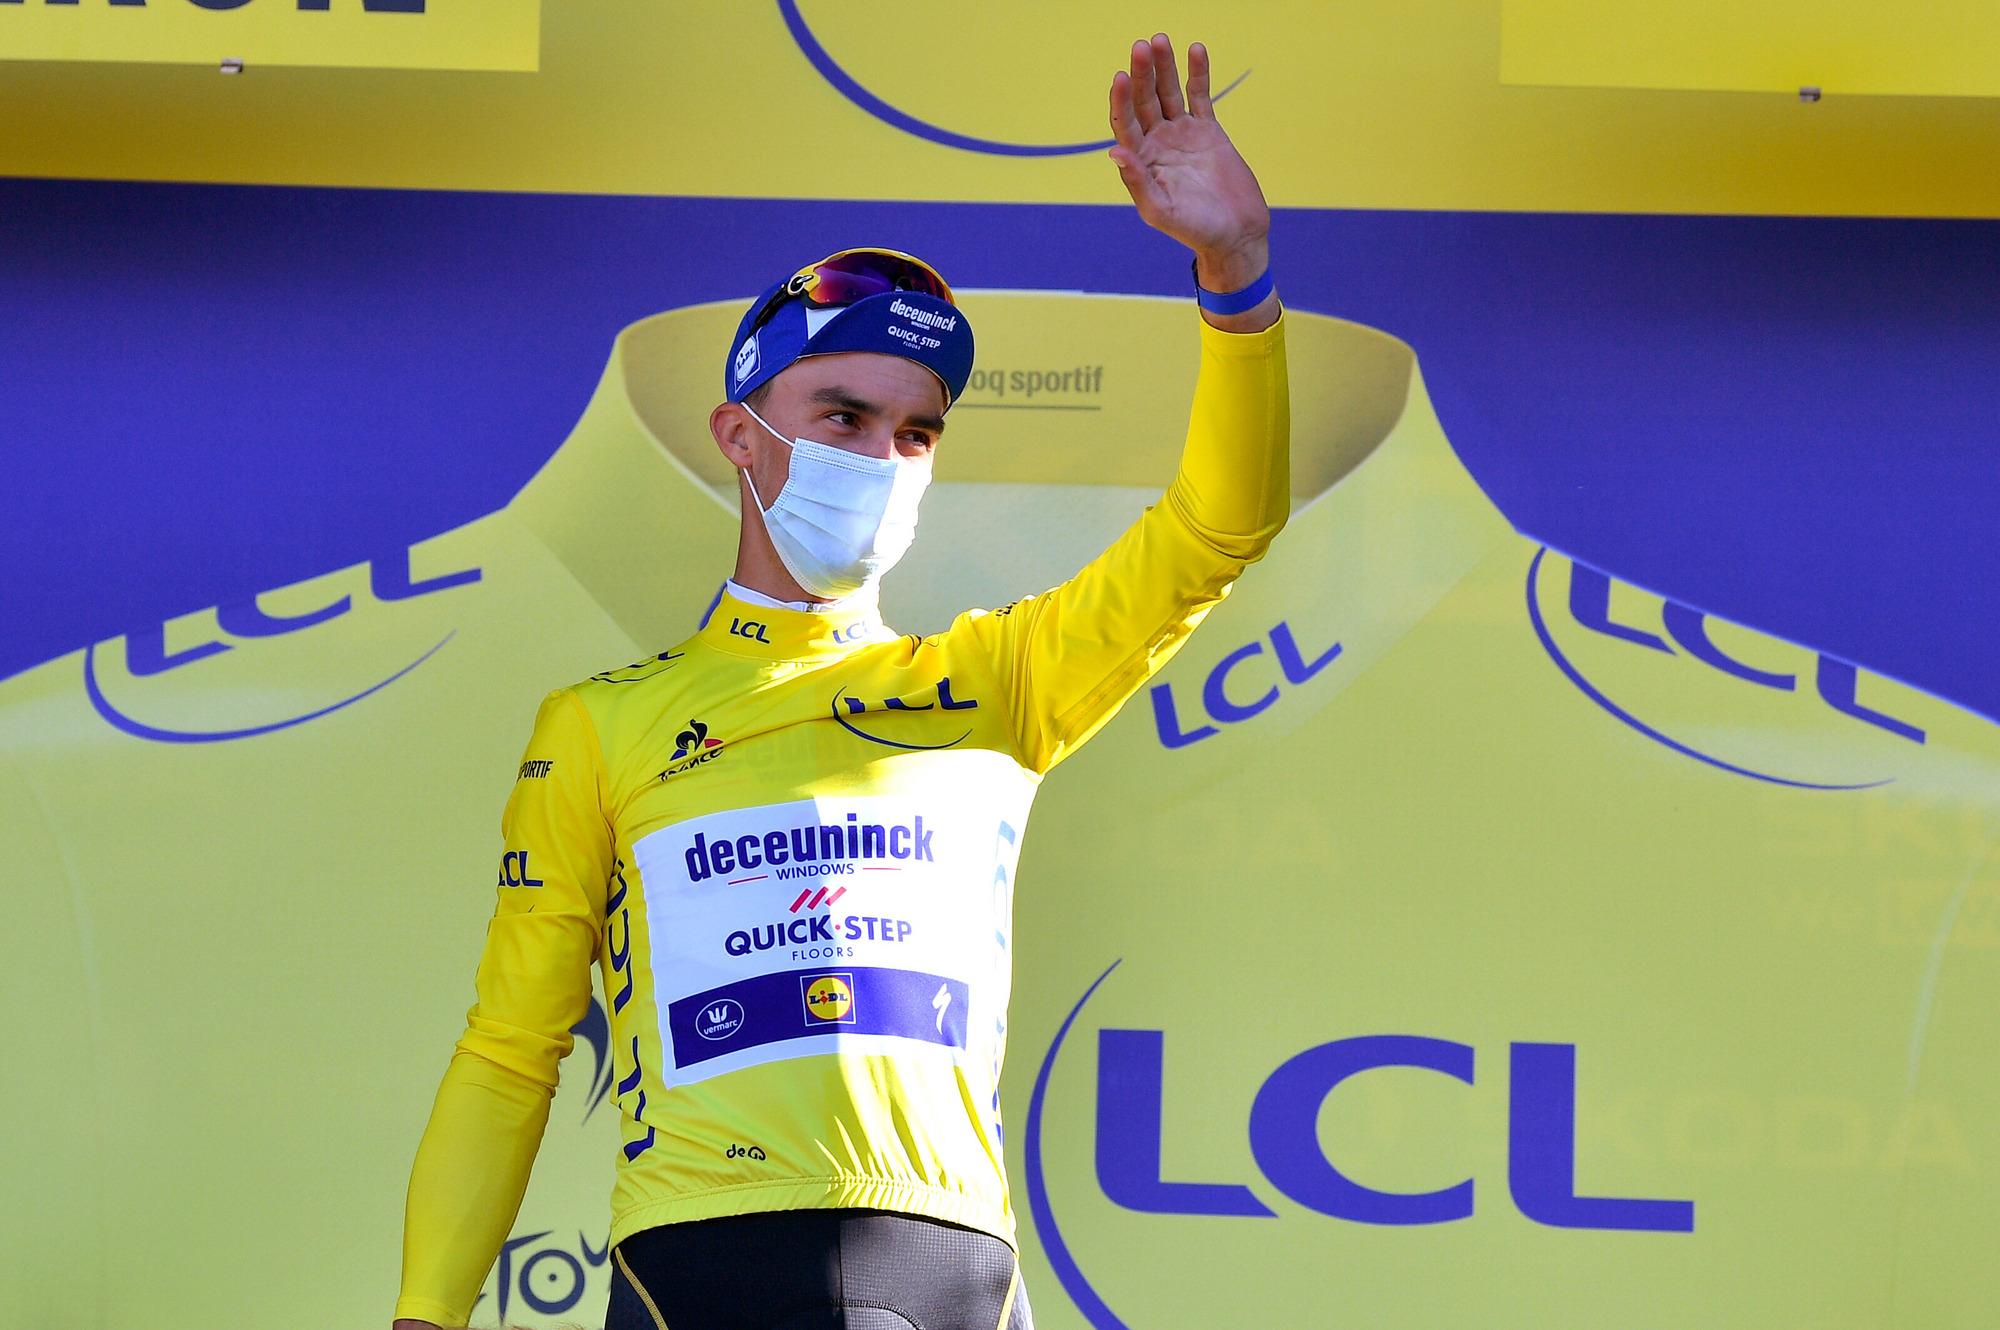 Tour de France 2020 107th Edition 3rd stage Nice Sisteron 198 km 31082020 Julian Alaphilippe FRA Deceuninck Quick Step photo POOL David StockmanBelgaBettiniPhoto2020